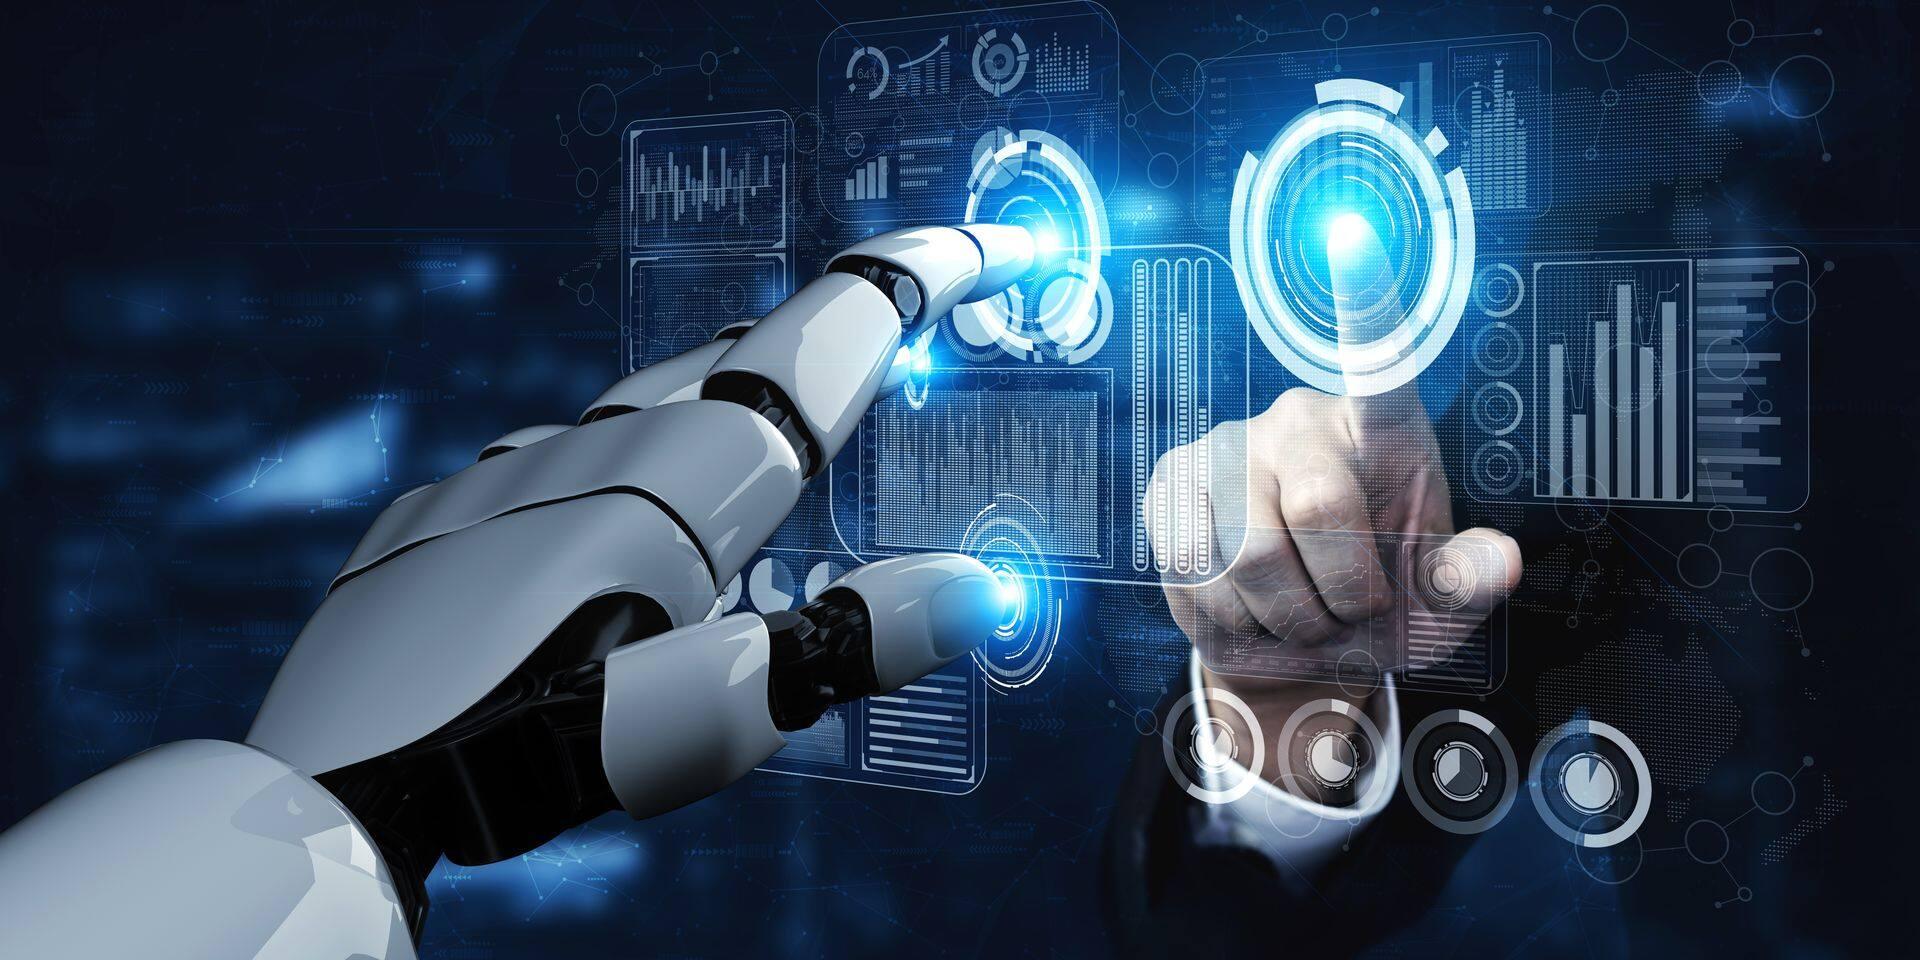 Biotechs, valeurs technologiques... où investir en 2021 ?